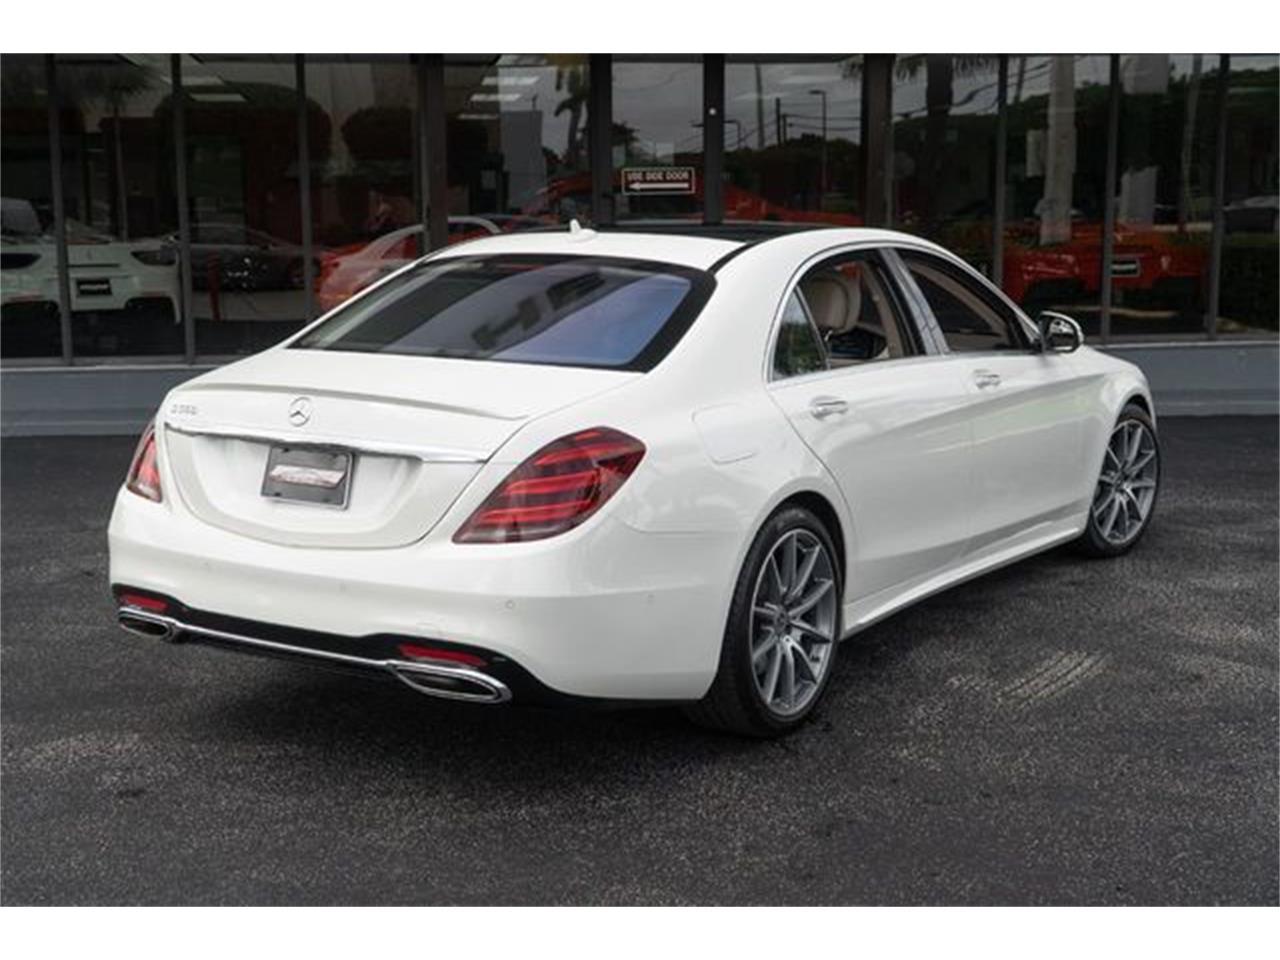 2019 Mercedes-Benz S-Class (CC-1421196) for sale in Miami, Florida